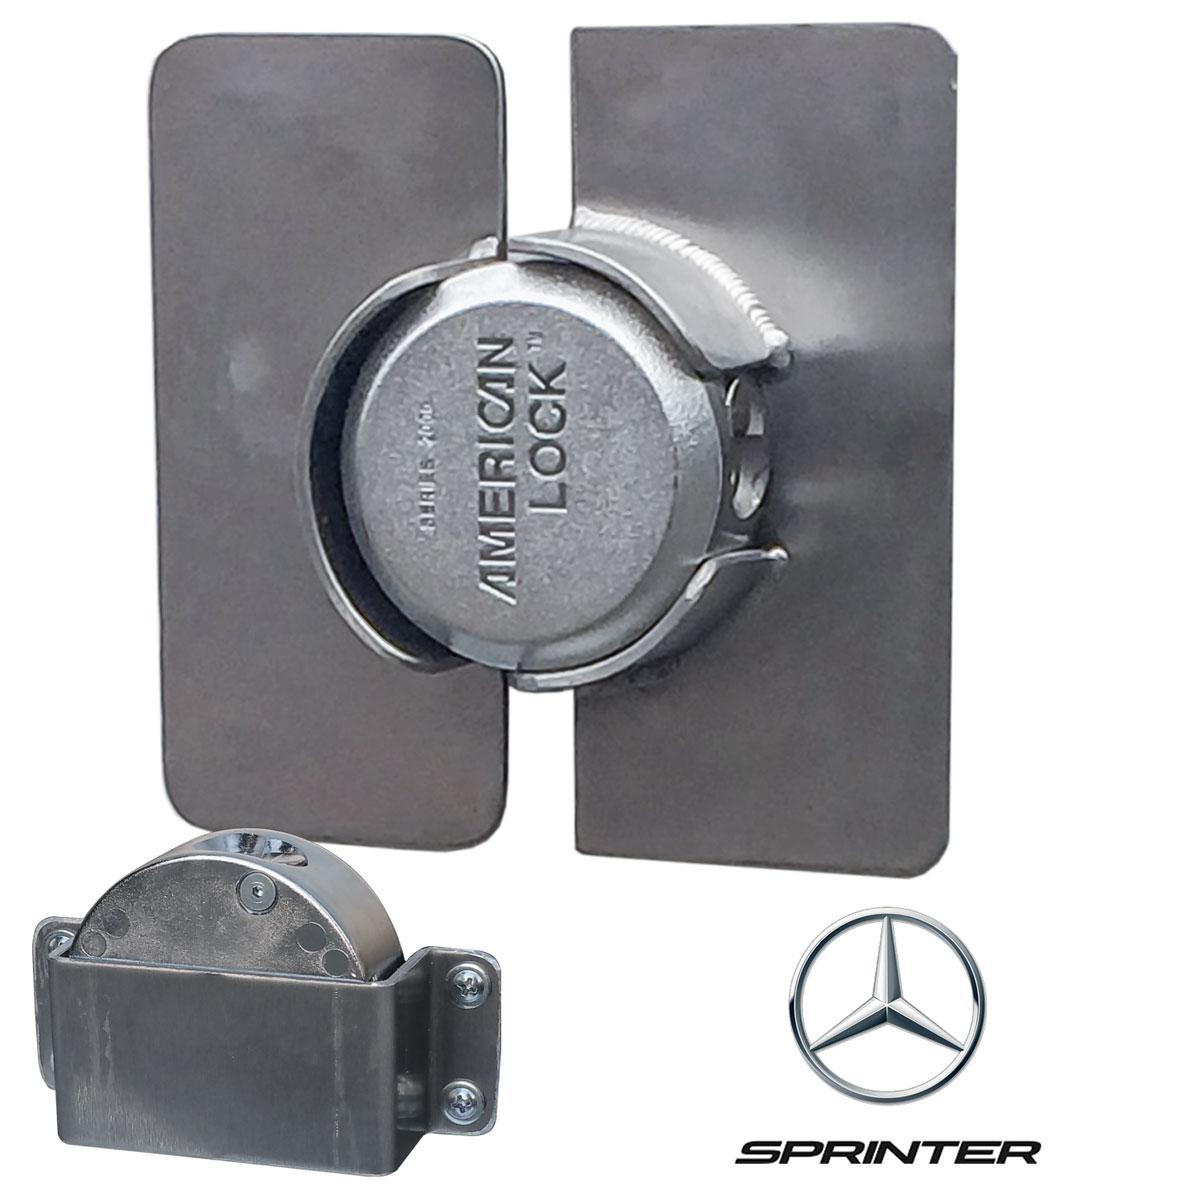 2019+ SprinterPuck Lock Kit Rear DoorSKU: 170044